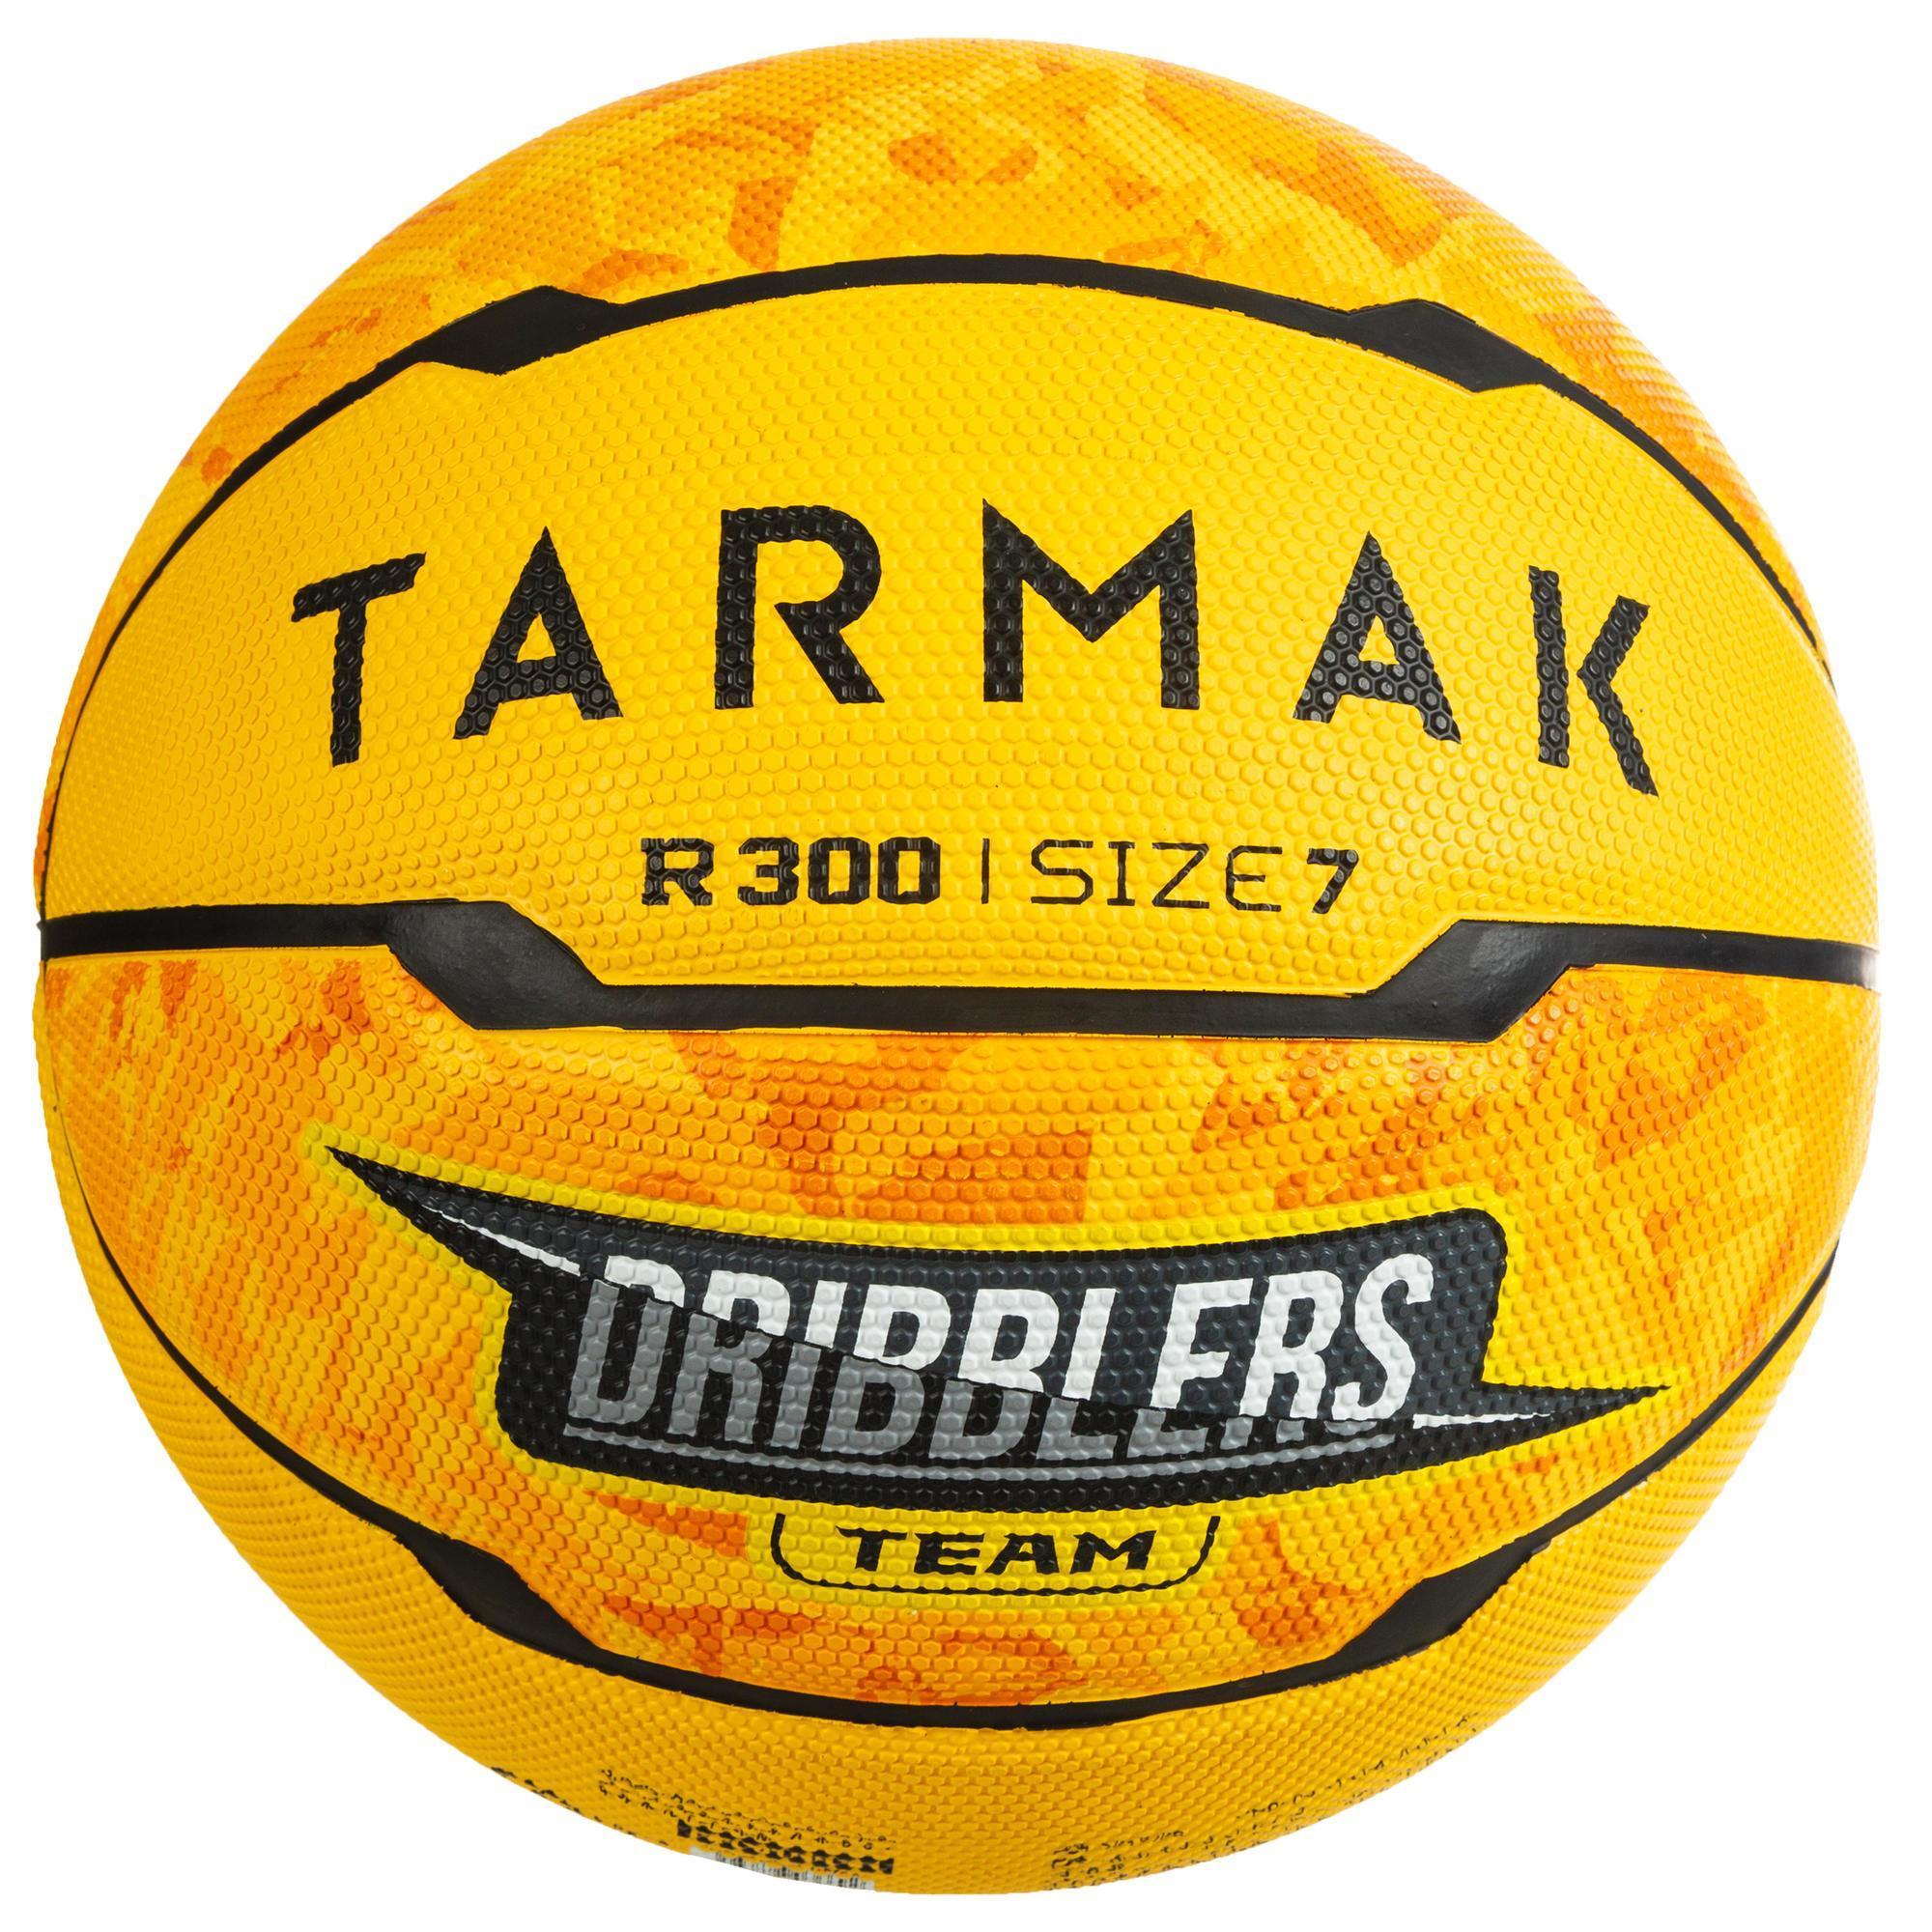 Tarmak Basketbal R300 geel (maat 7)